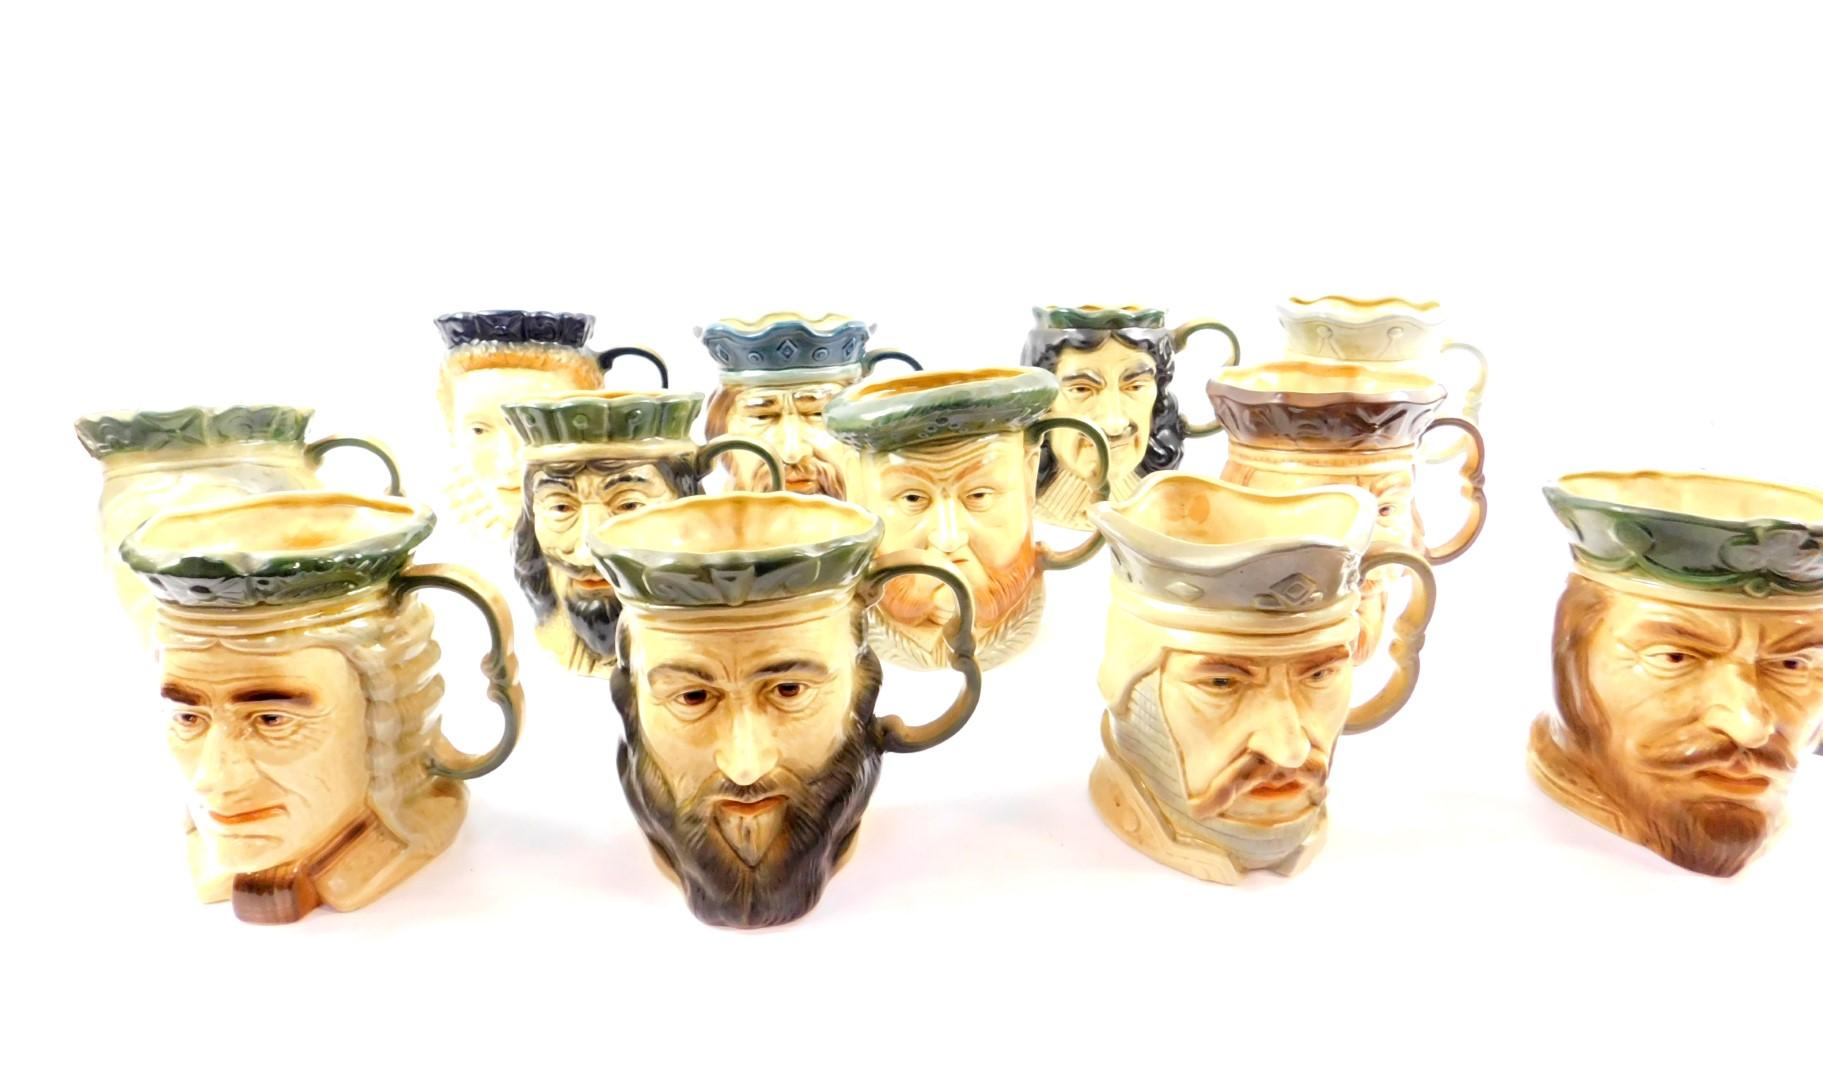 Lot 40 - Twelve Kingston Pottery Hull large character jugs, printed marks, comprising Charles I, Charles